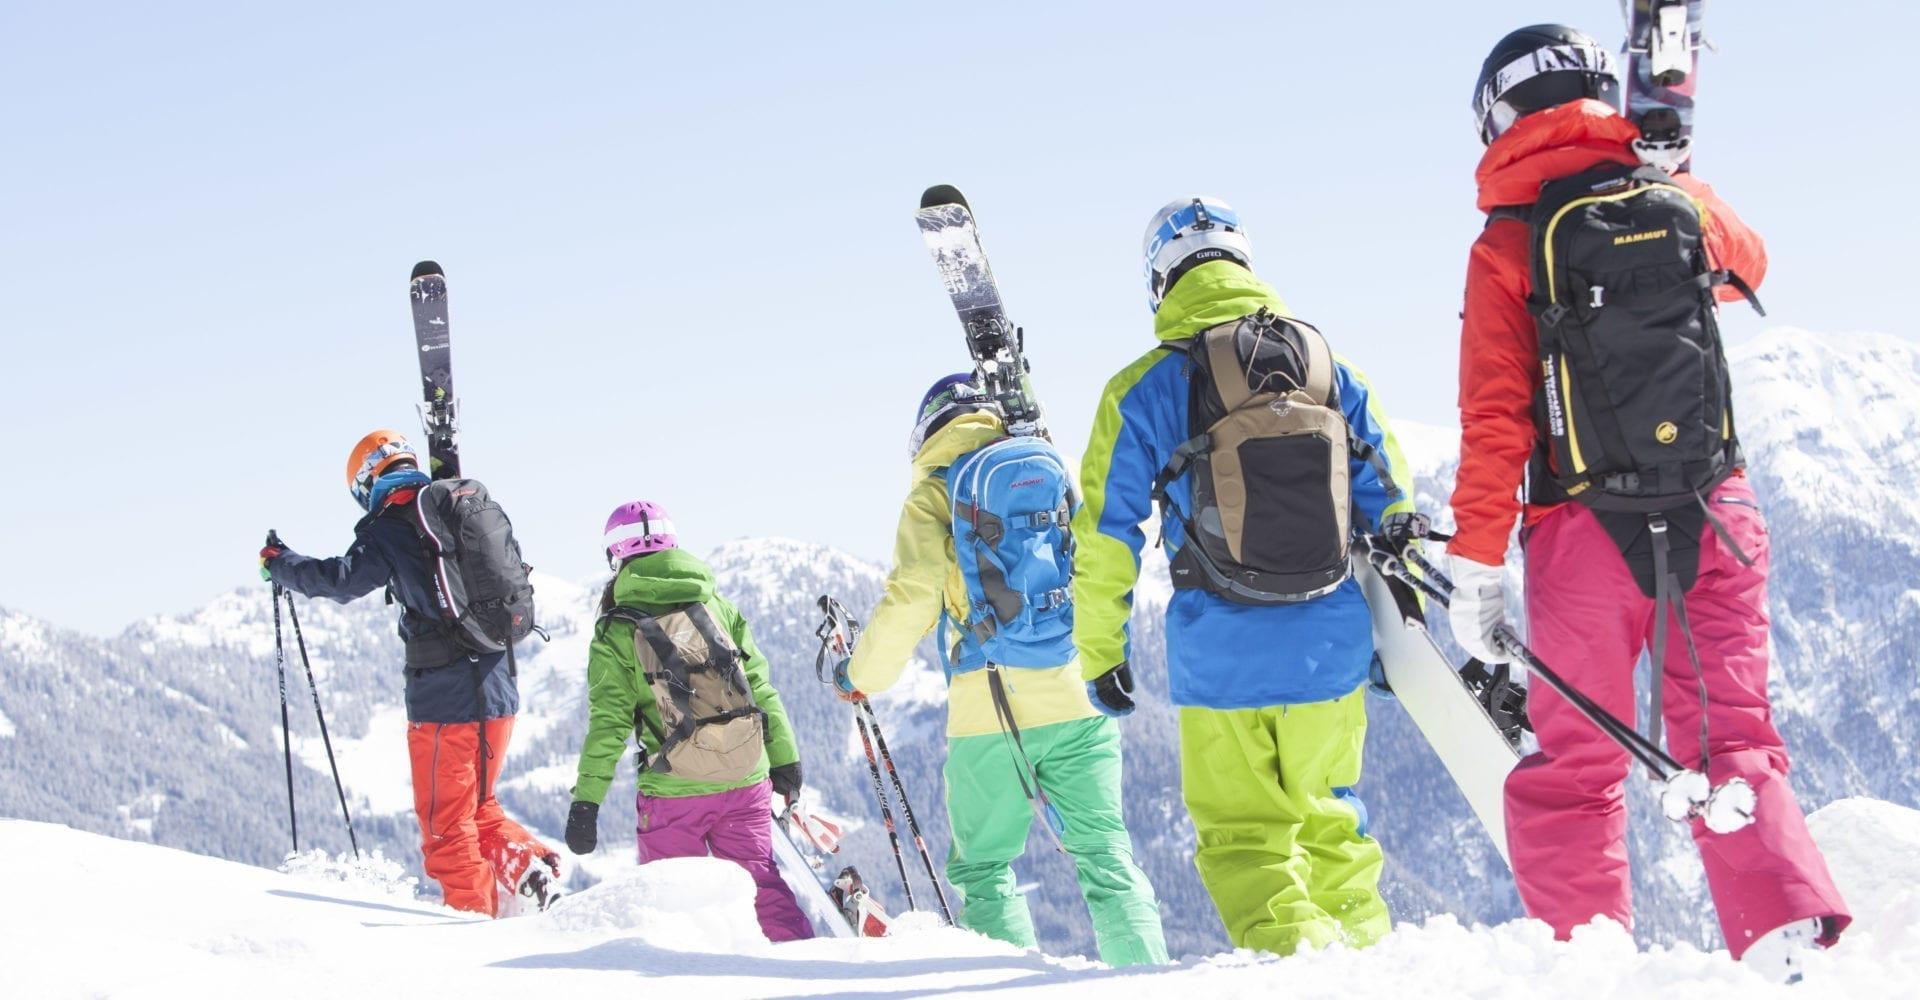 skifahrer-snowboarder-freeski